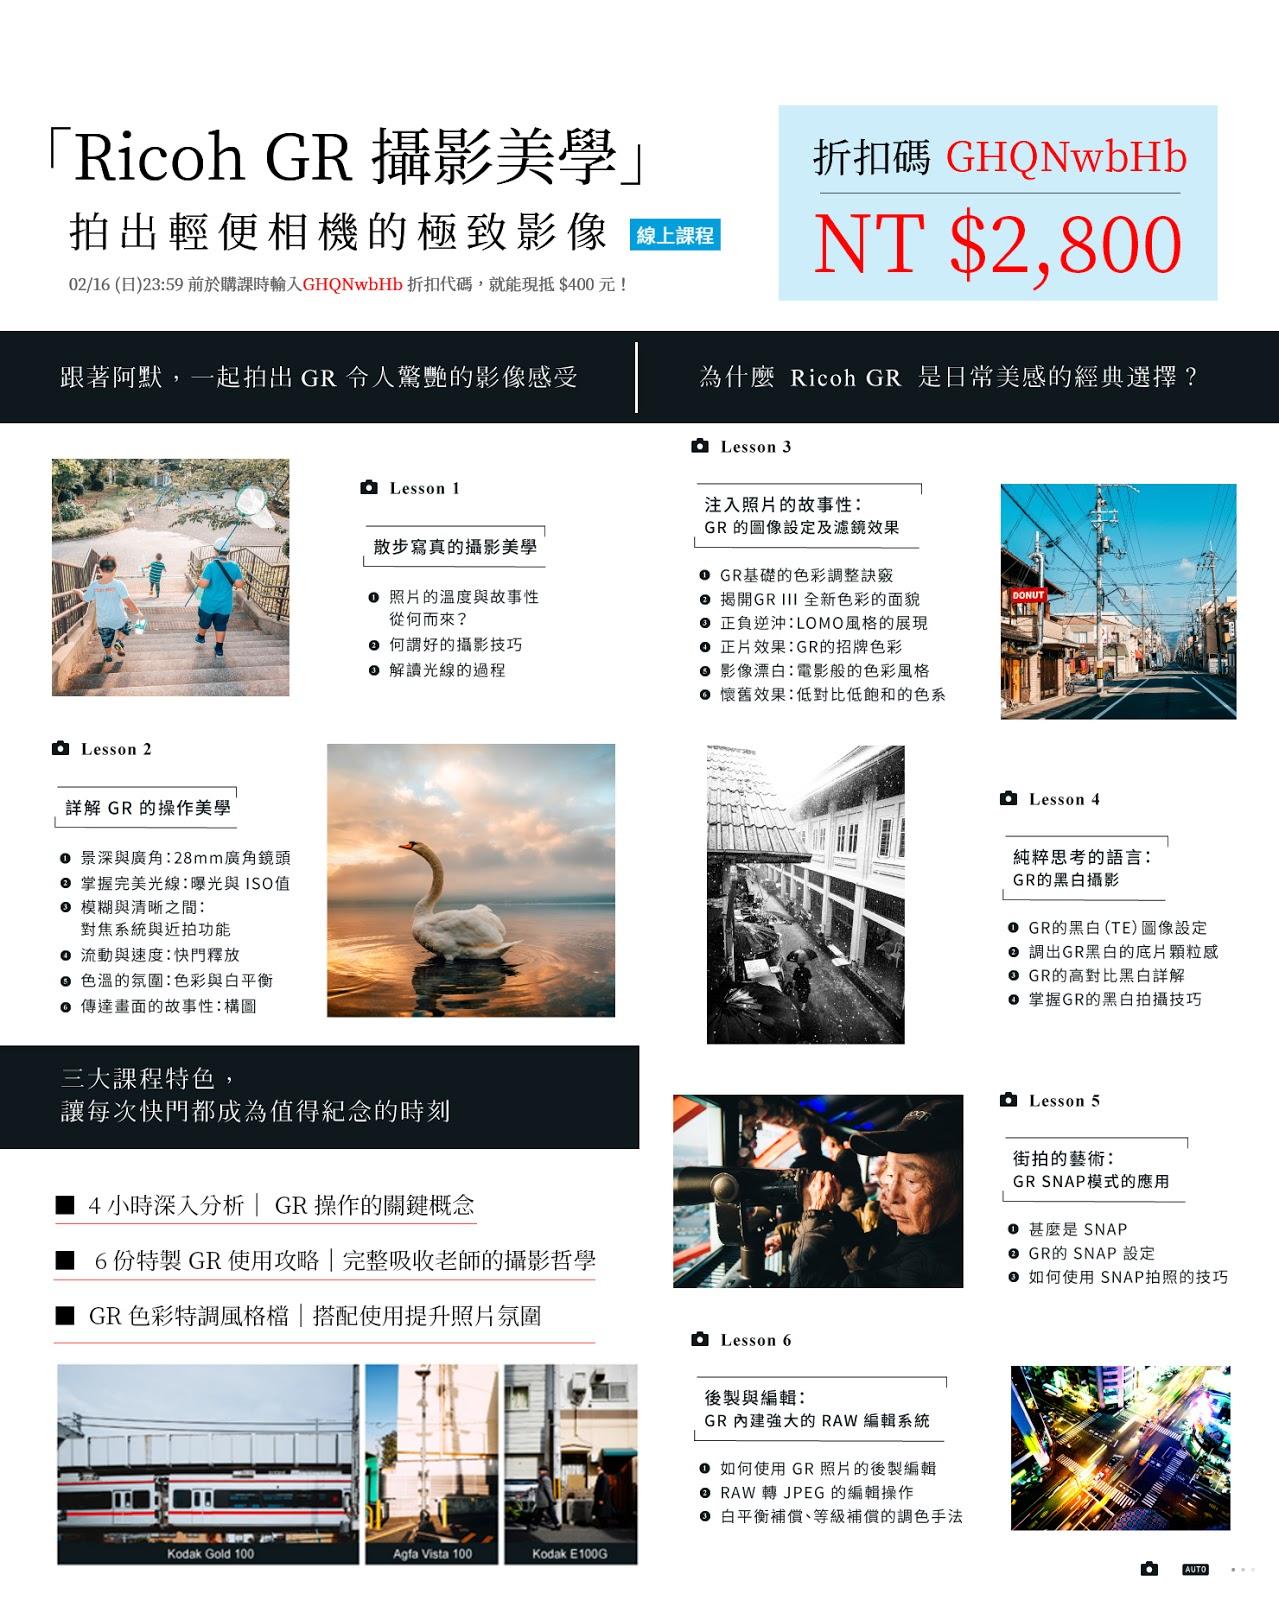 「Ricoh GR 攝影美學」線上課程 | 優惠折扣 2020/02/13~ 2020/02/16